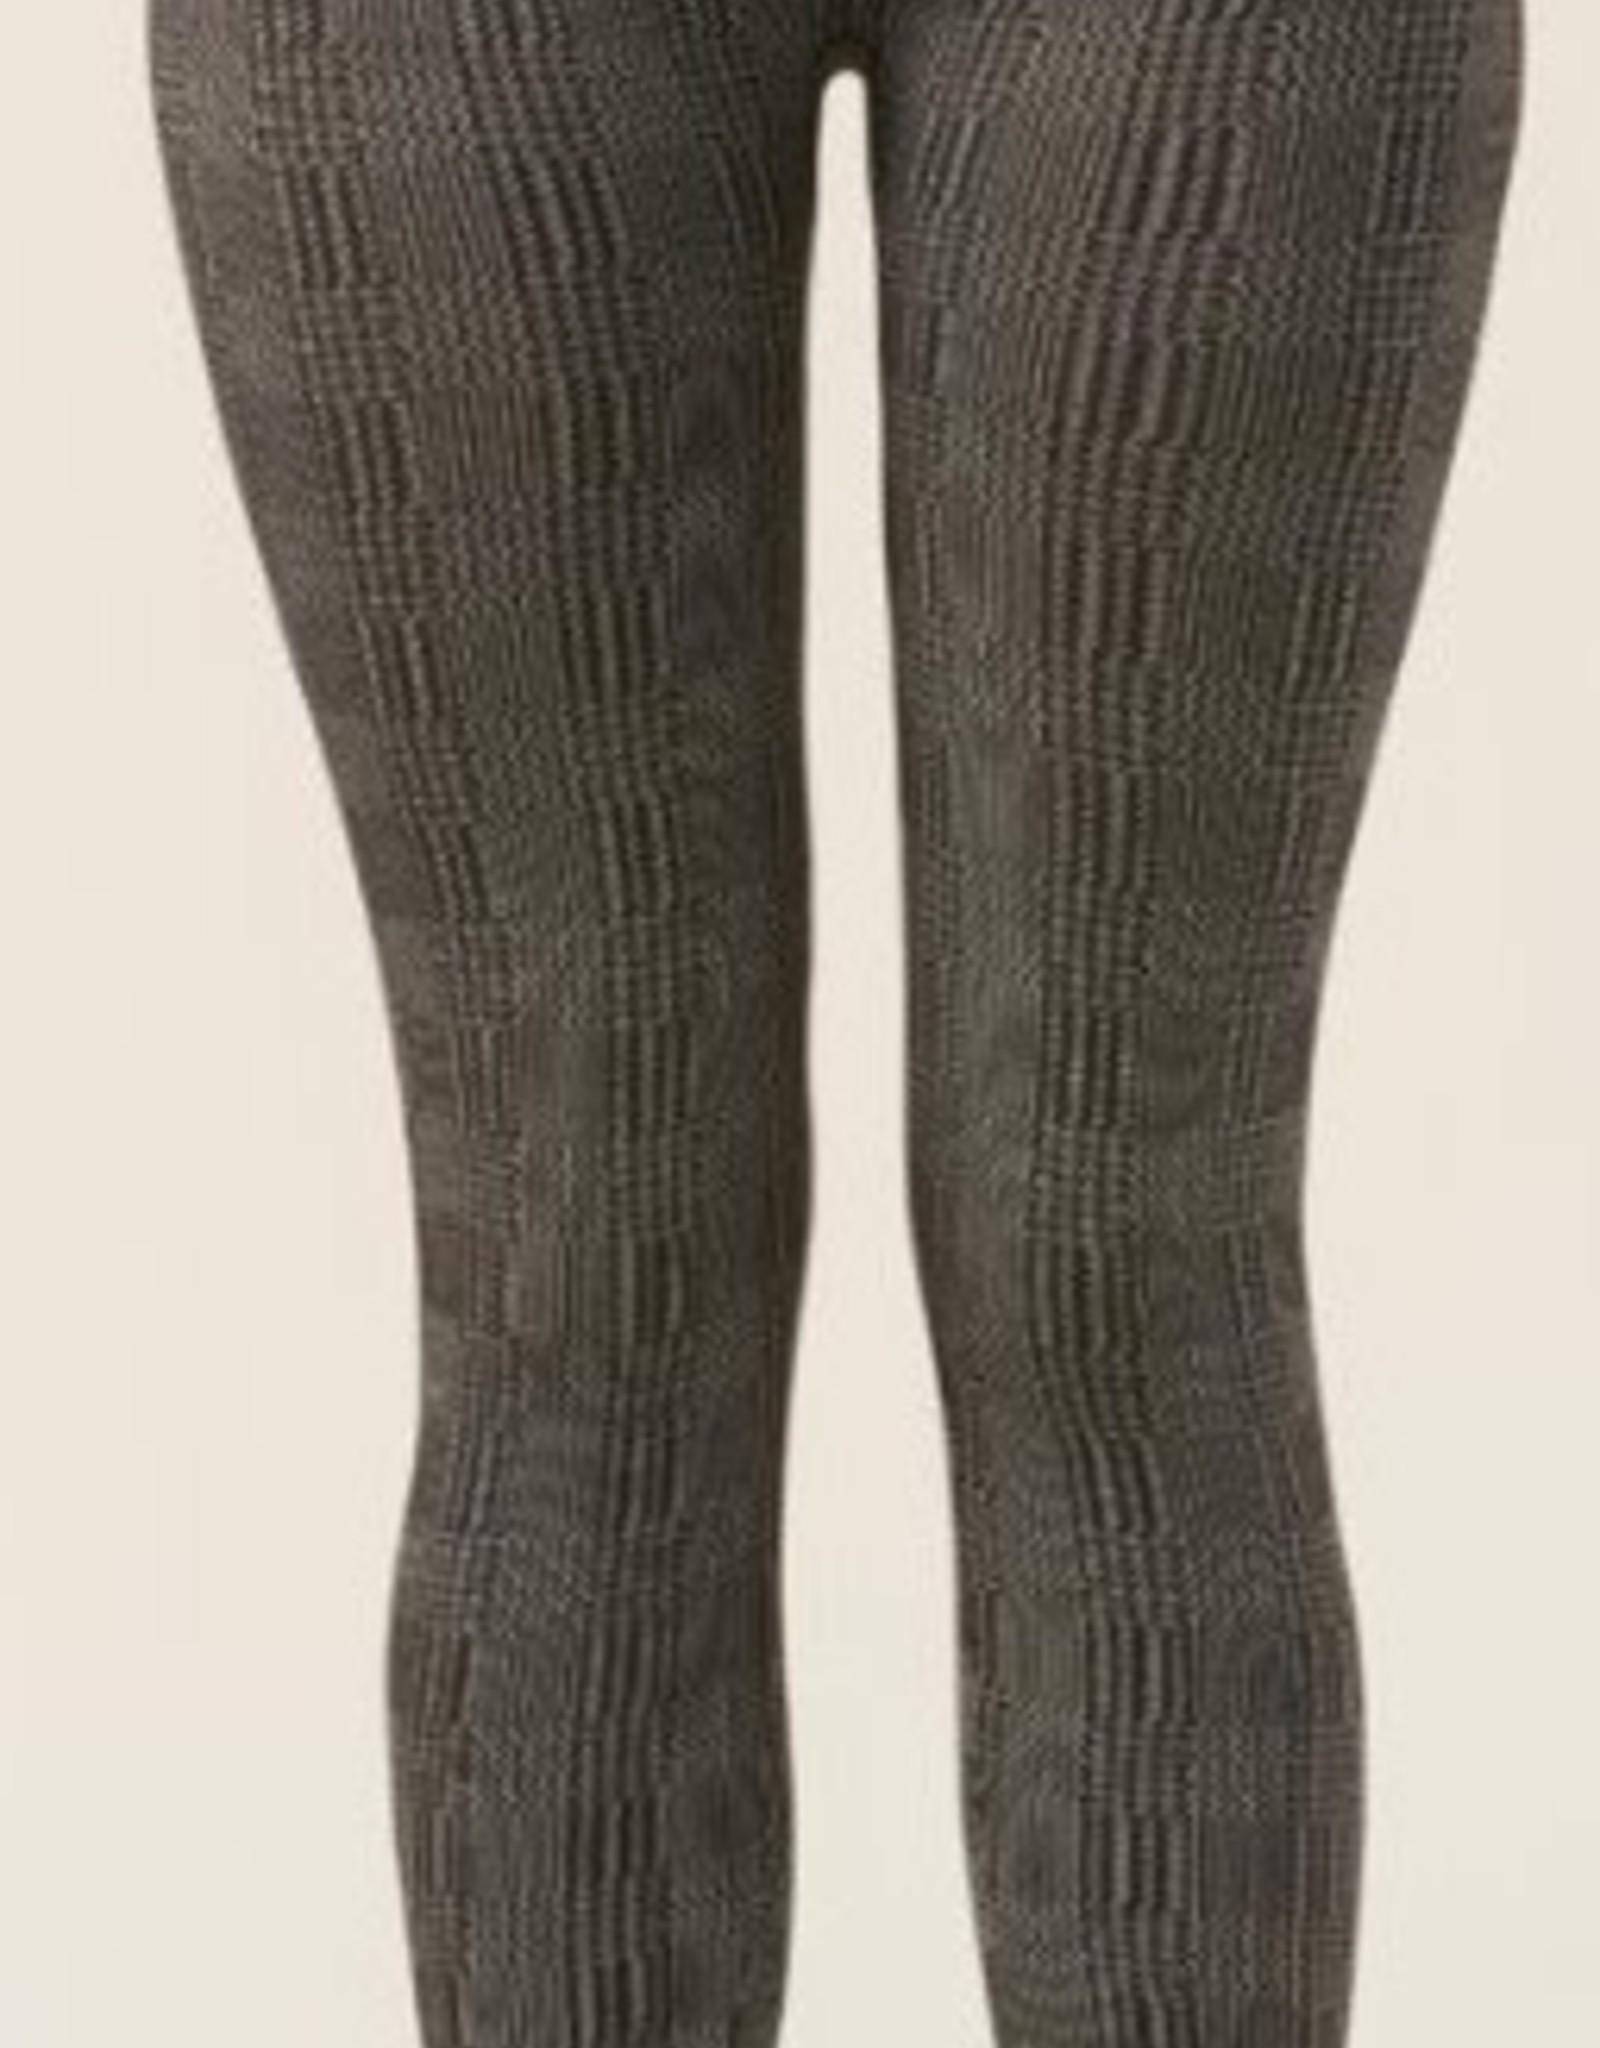 Charlie Paige Spandex Blend Jacquard Leggings